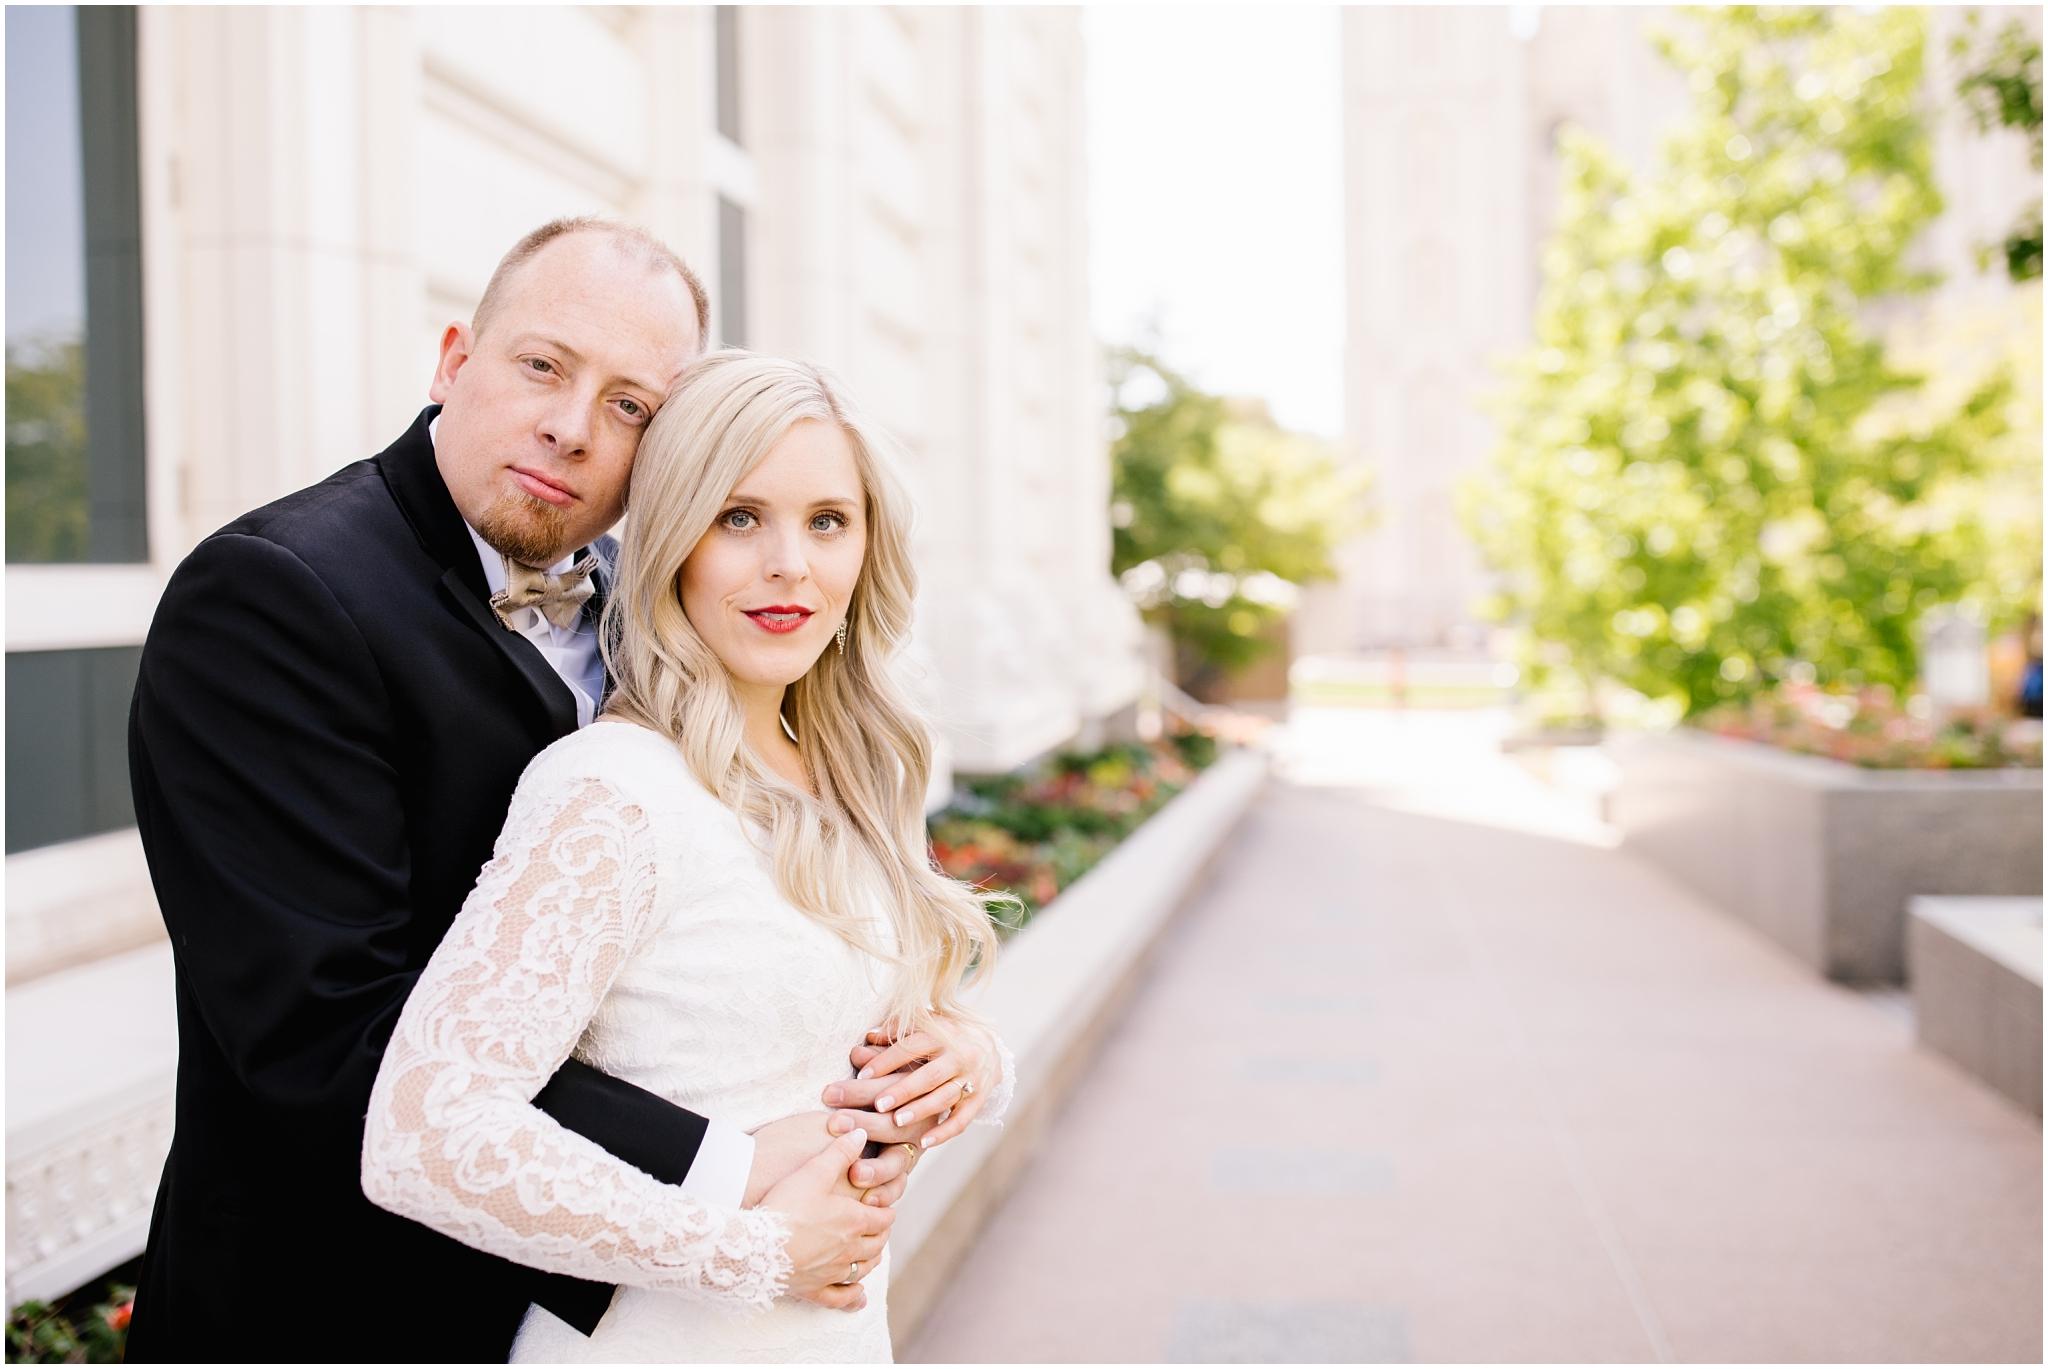 CherylandTyler-281_Lizzie-B-Imagery-Utah-Wedding-Photographer-Salt-Lake-City-Temple-Wells-Fargo-Building-Reception.jpg